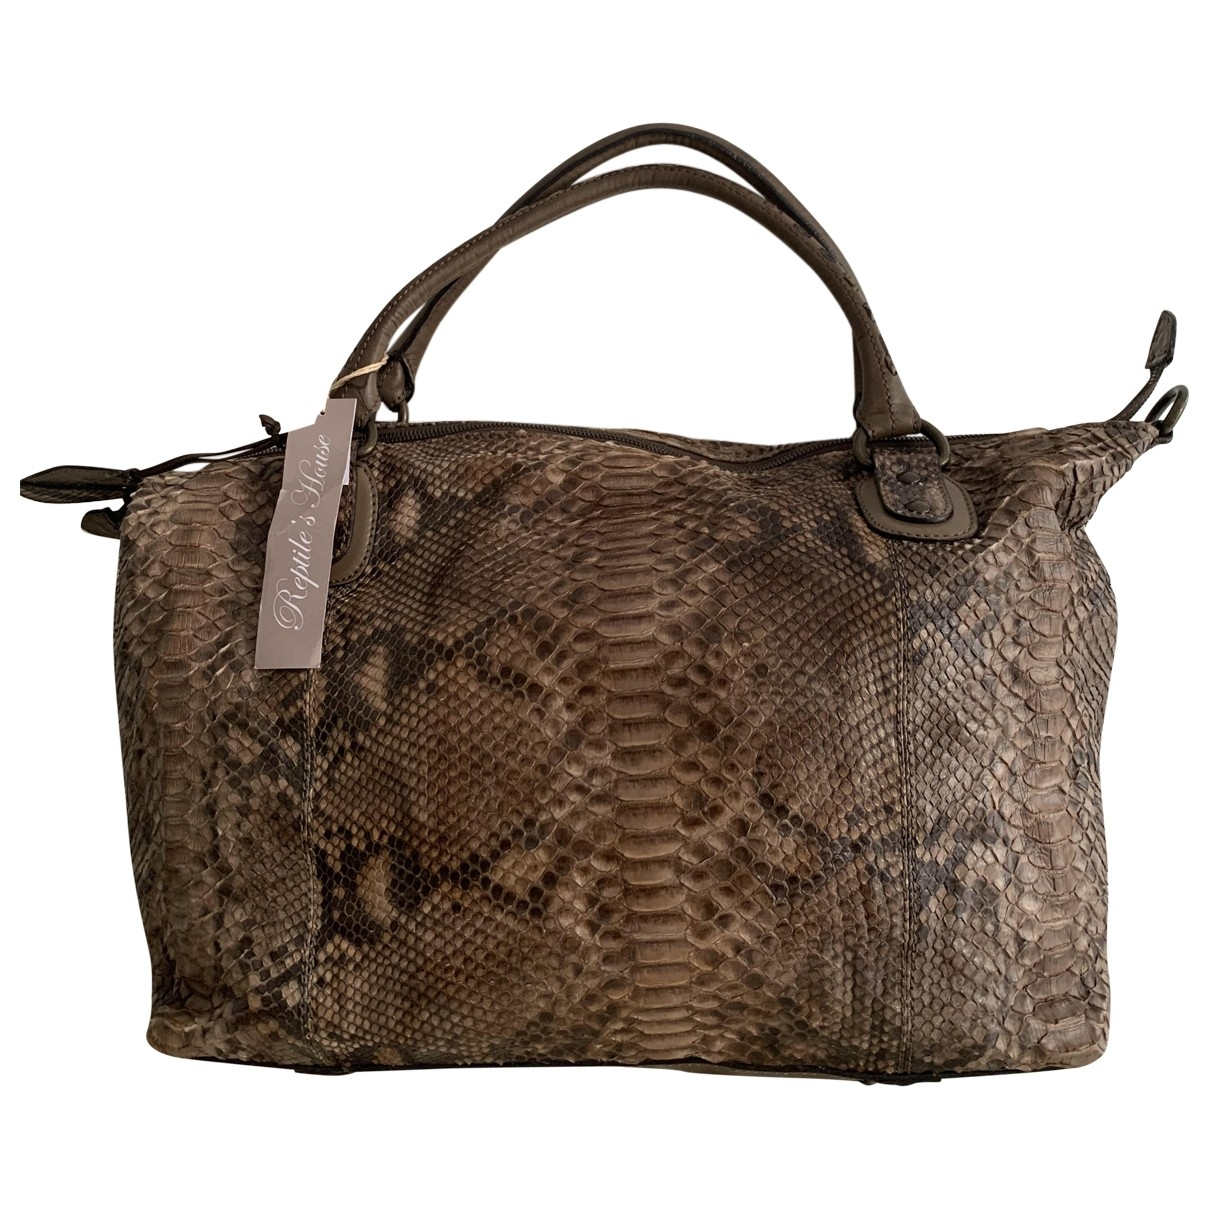 Reptile's House \N Python handbag for Women \N